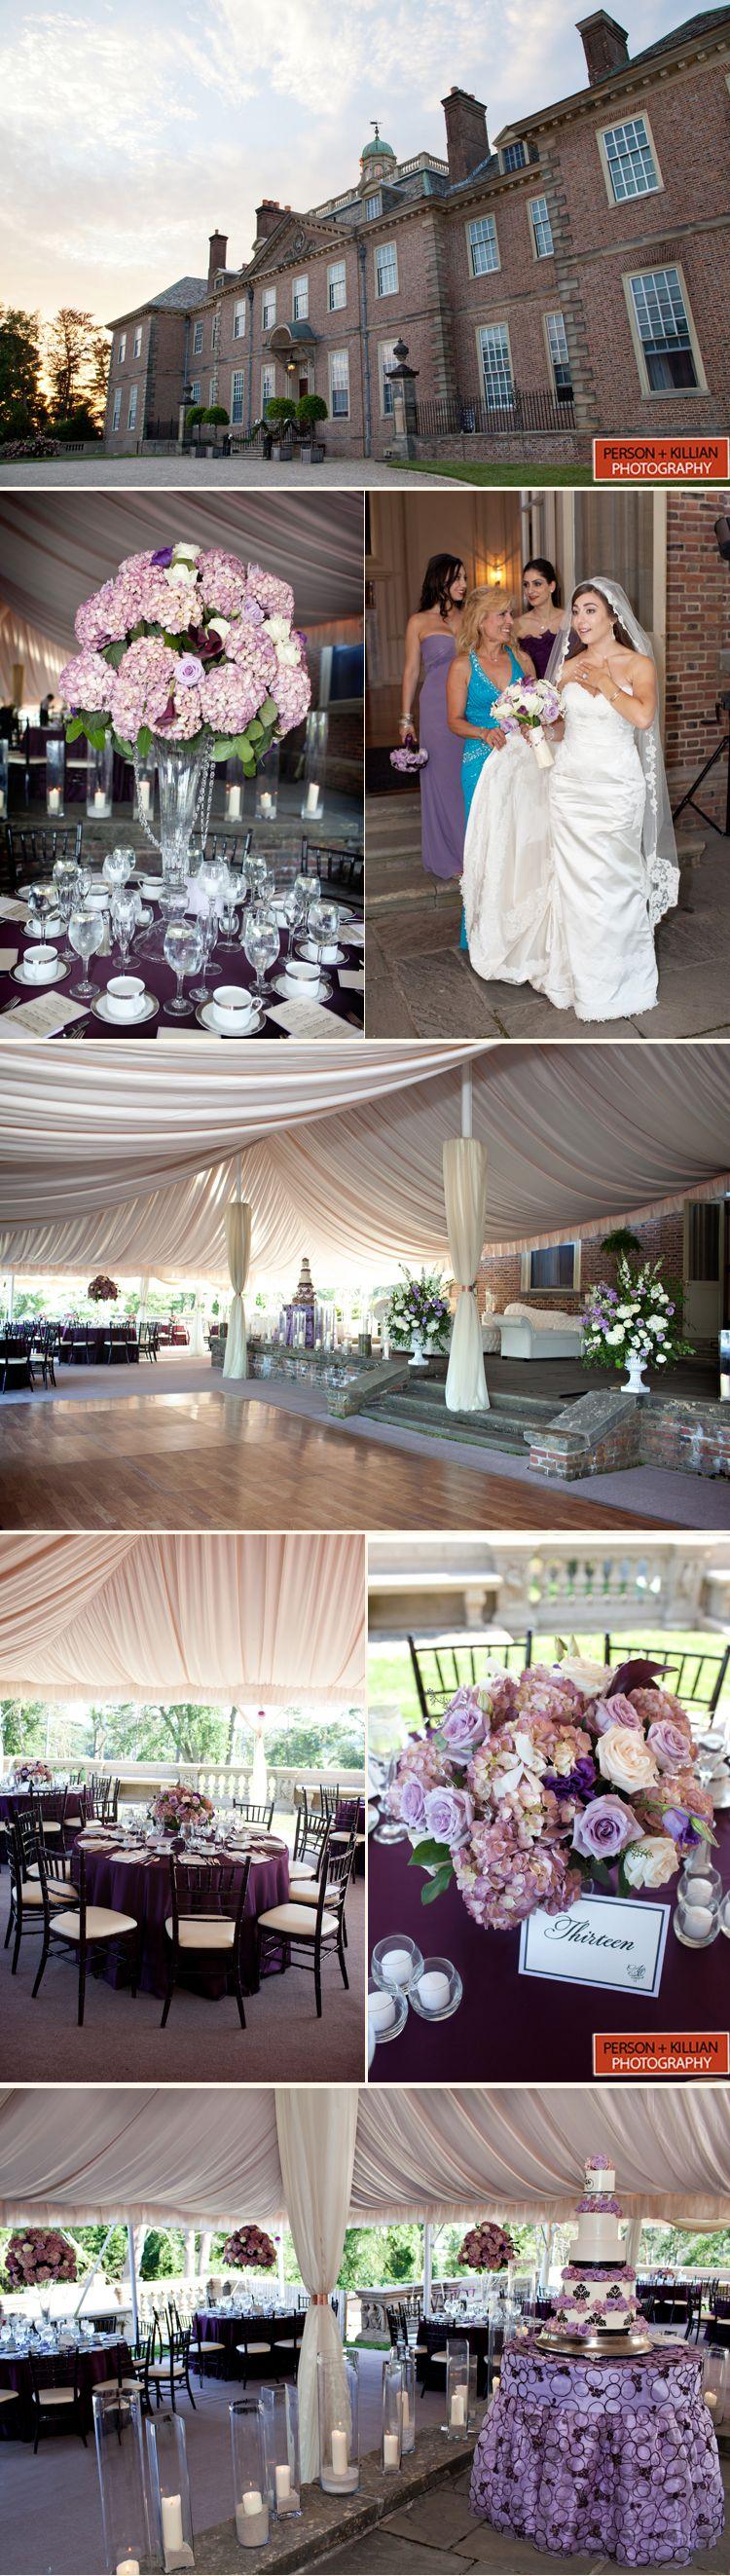 Wedding Ceremony At The Inn With Barn Reception On Crane Estate Ipswich MA